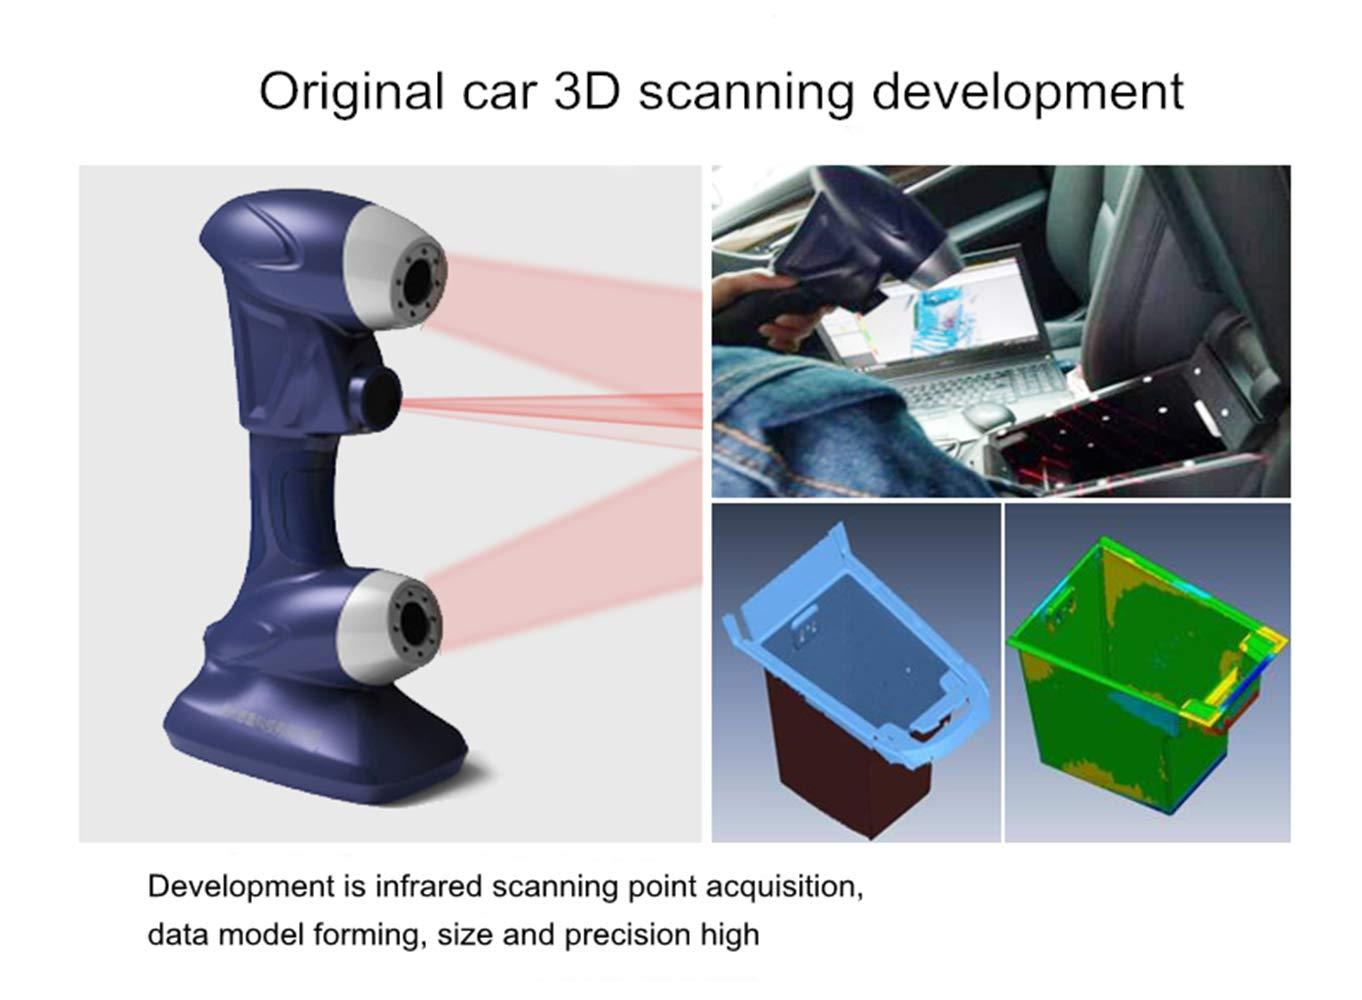 Para V W Passat Caja de almacenamiento del apoyabrazos Con tapete antideslizante Car Central Consola interior para reposabrazos